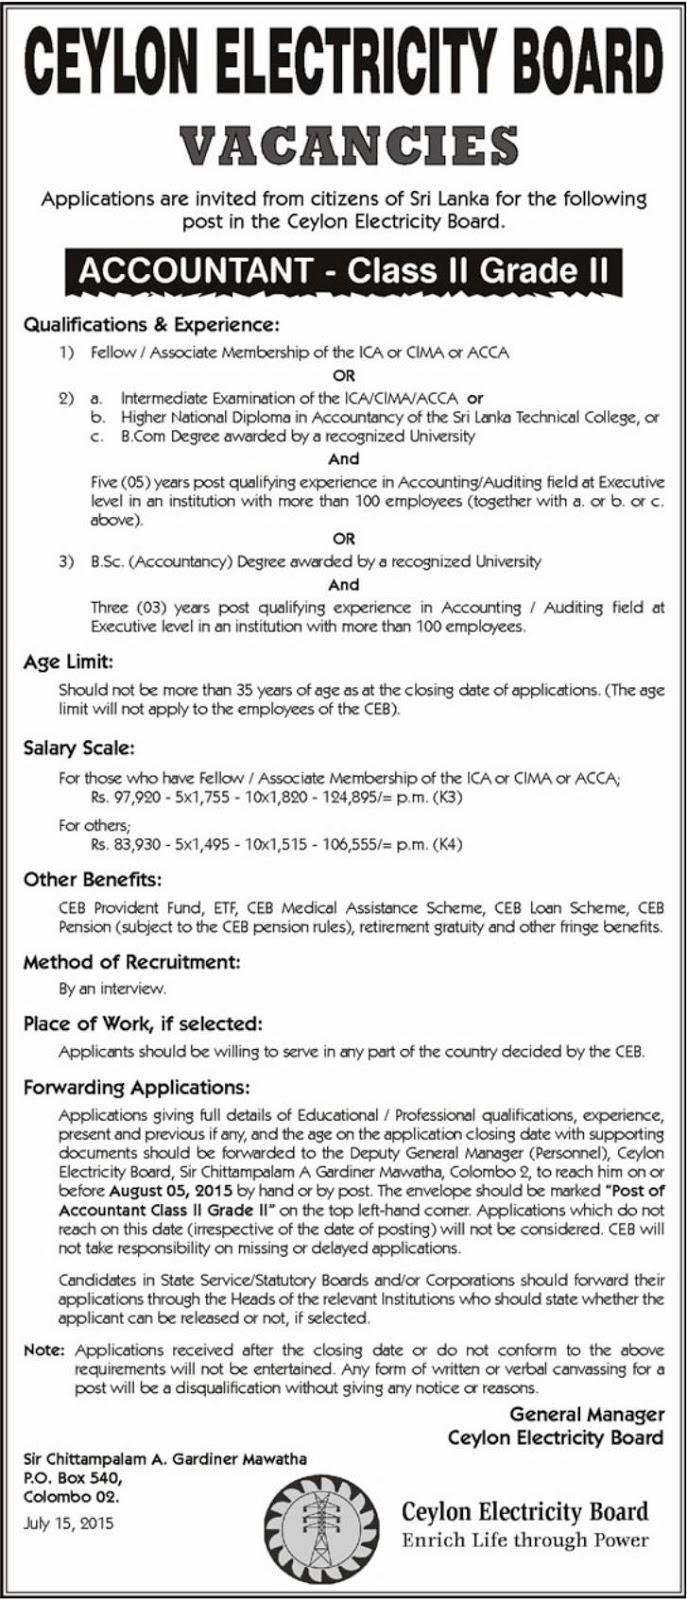 Ceb Vacancies Accountant Post Class 3 Salary Rs 124 985